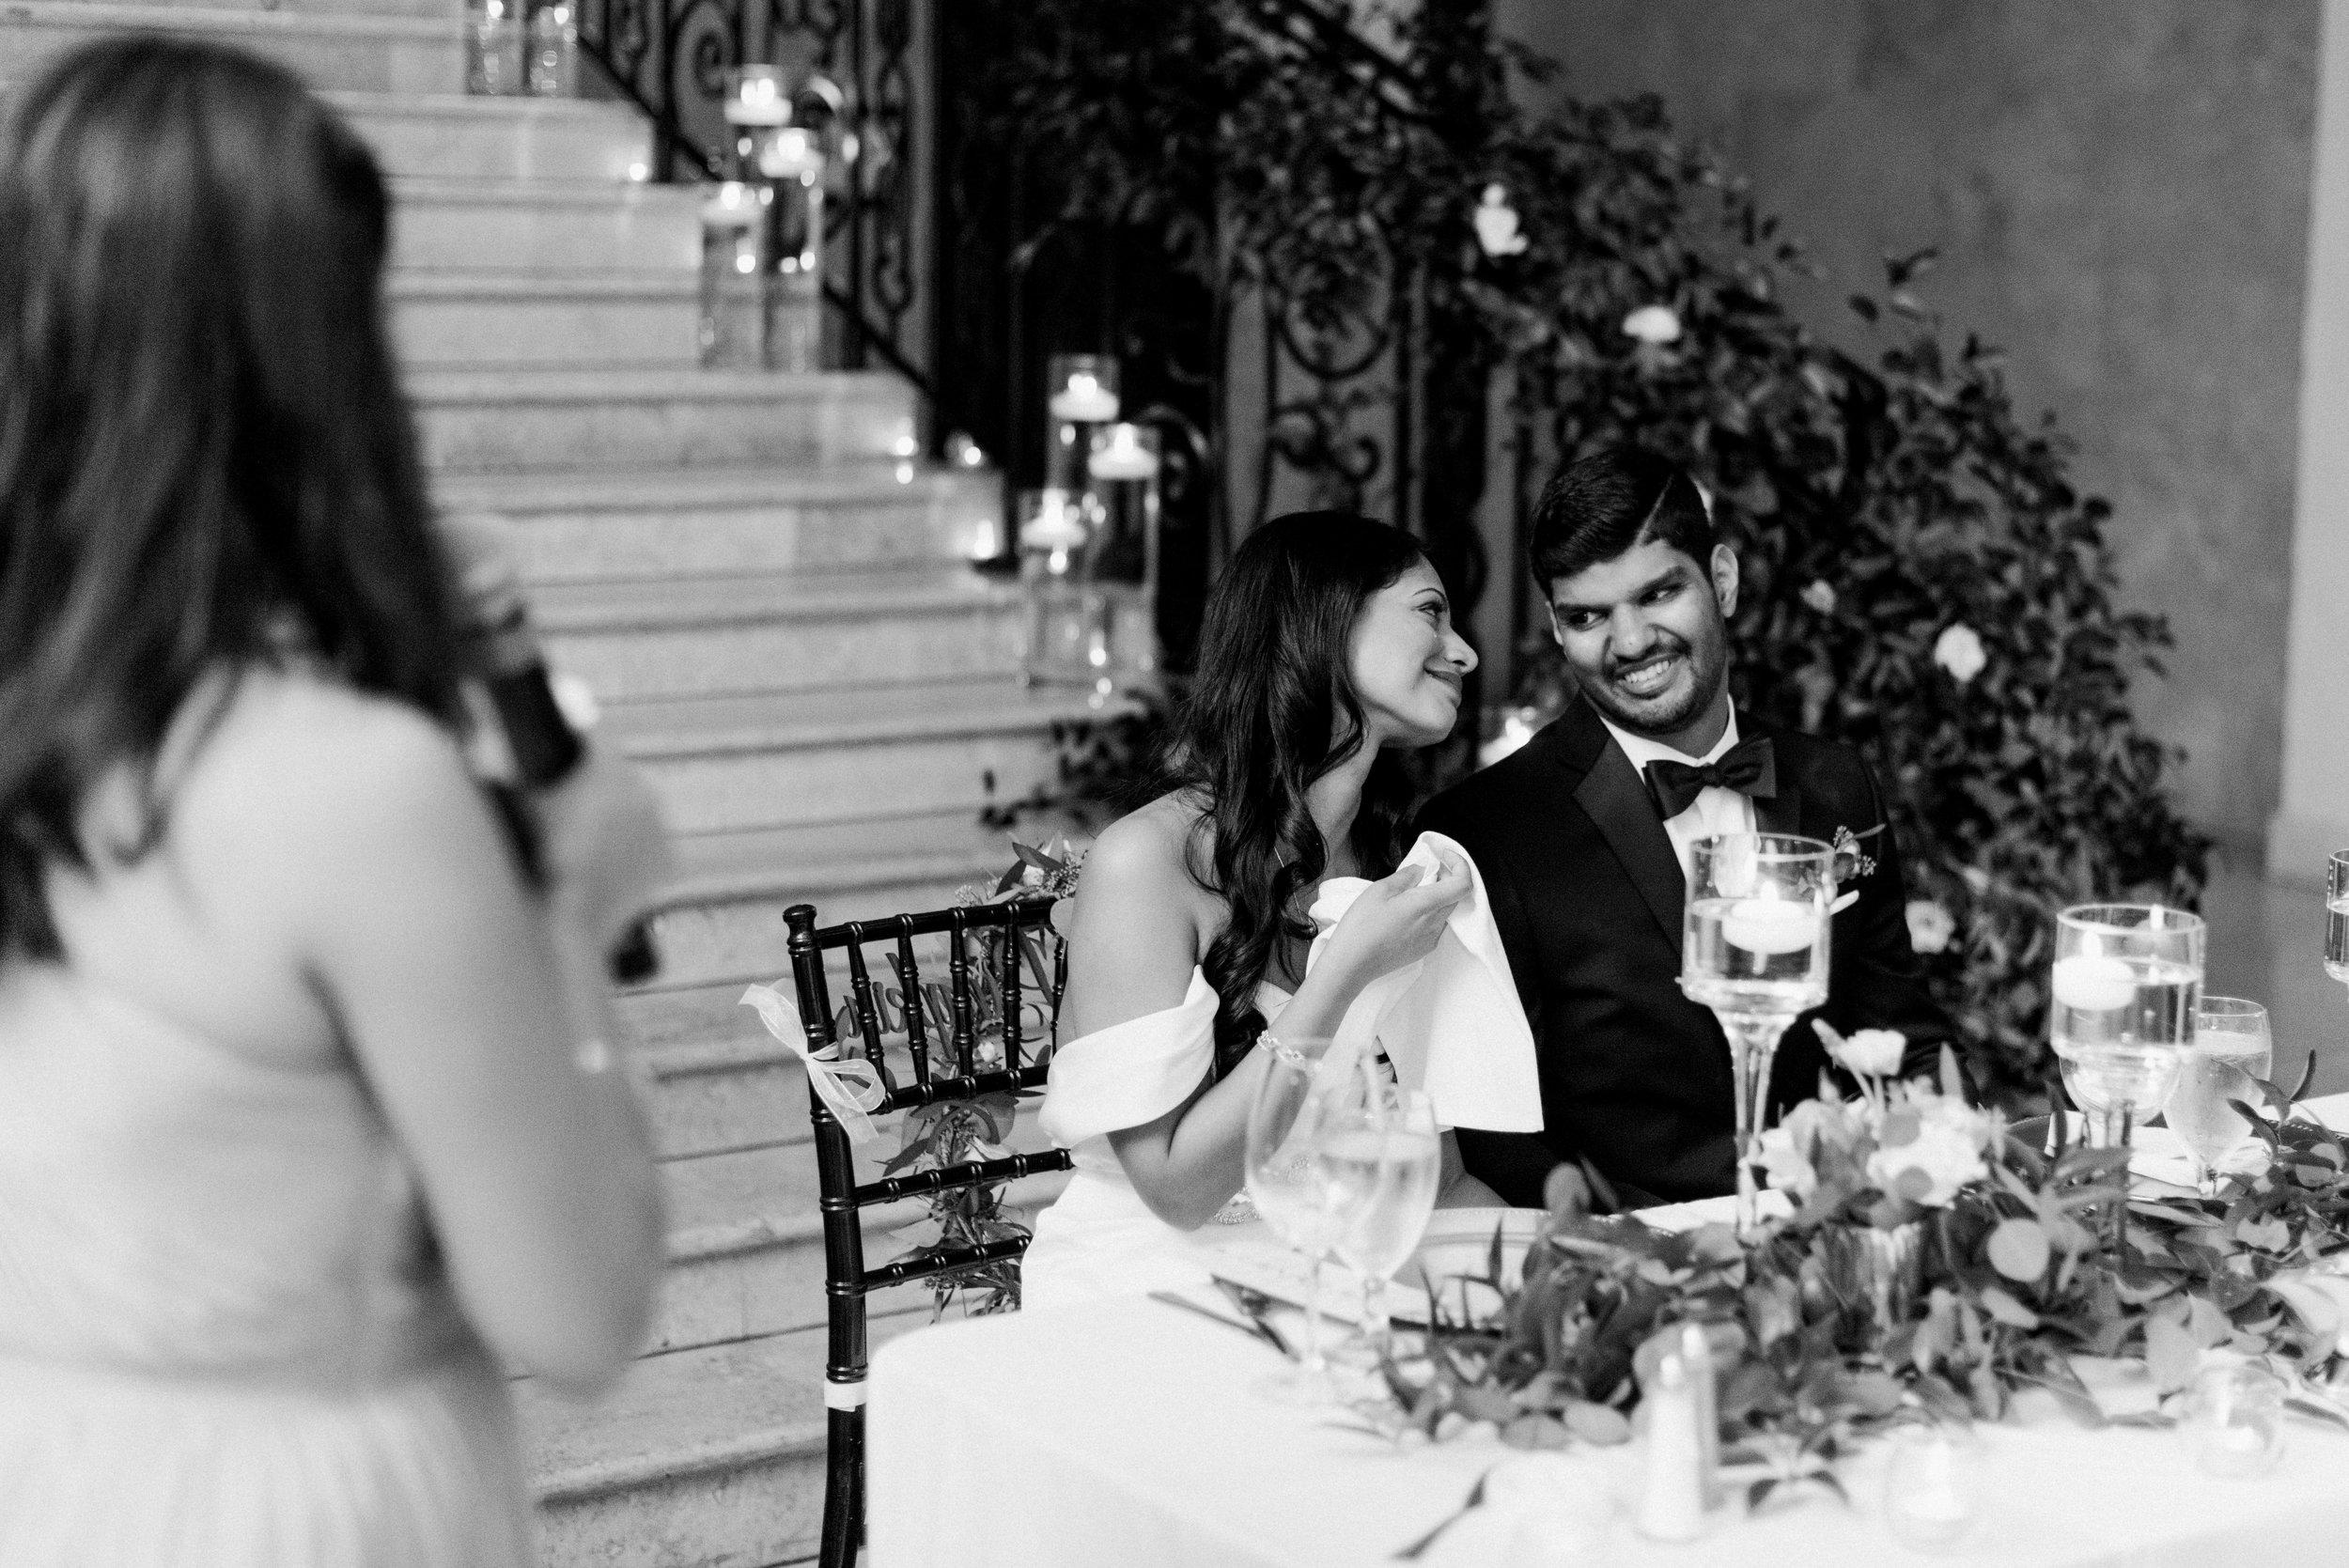 Fine-Art-Film-Houston-Wedding-Photographer-Best-Top-Luxury-Texas-Austin-Dallas-Destination-Dana-Fernandez-Photography-The-Bell-Tower-on-34th-Indian-34.jpg